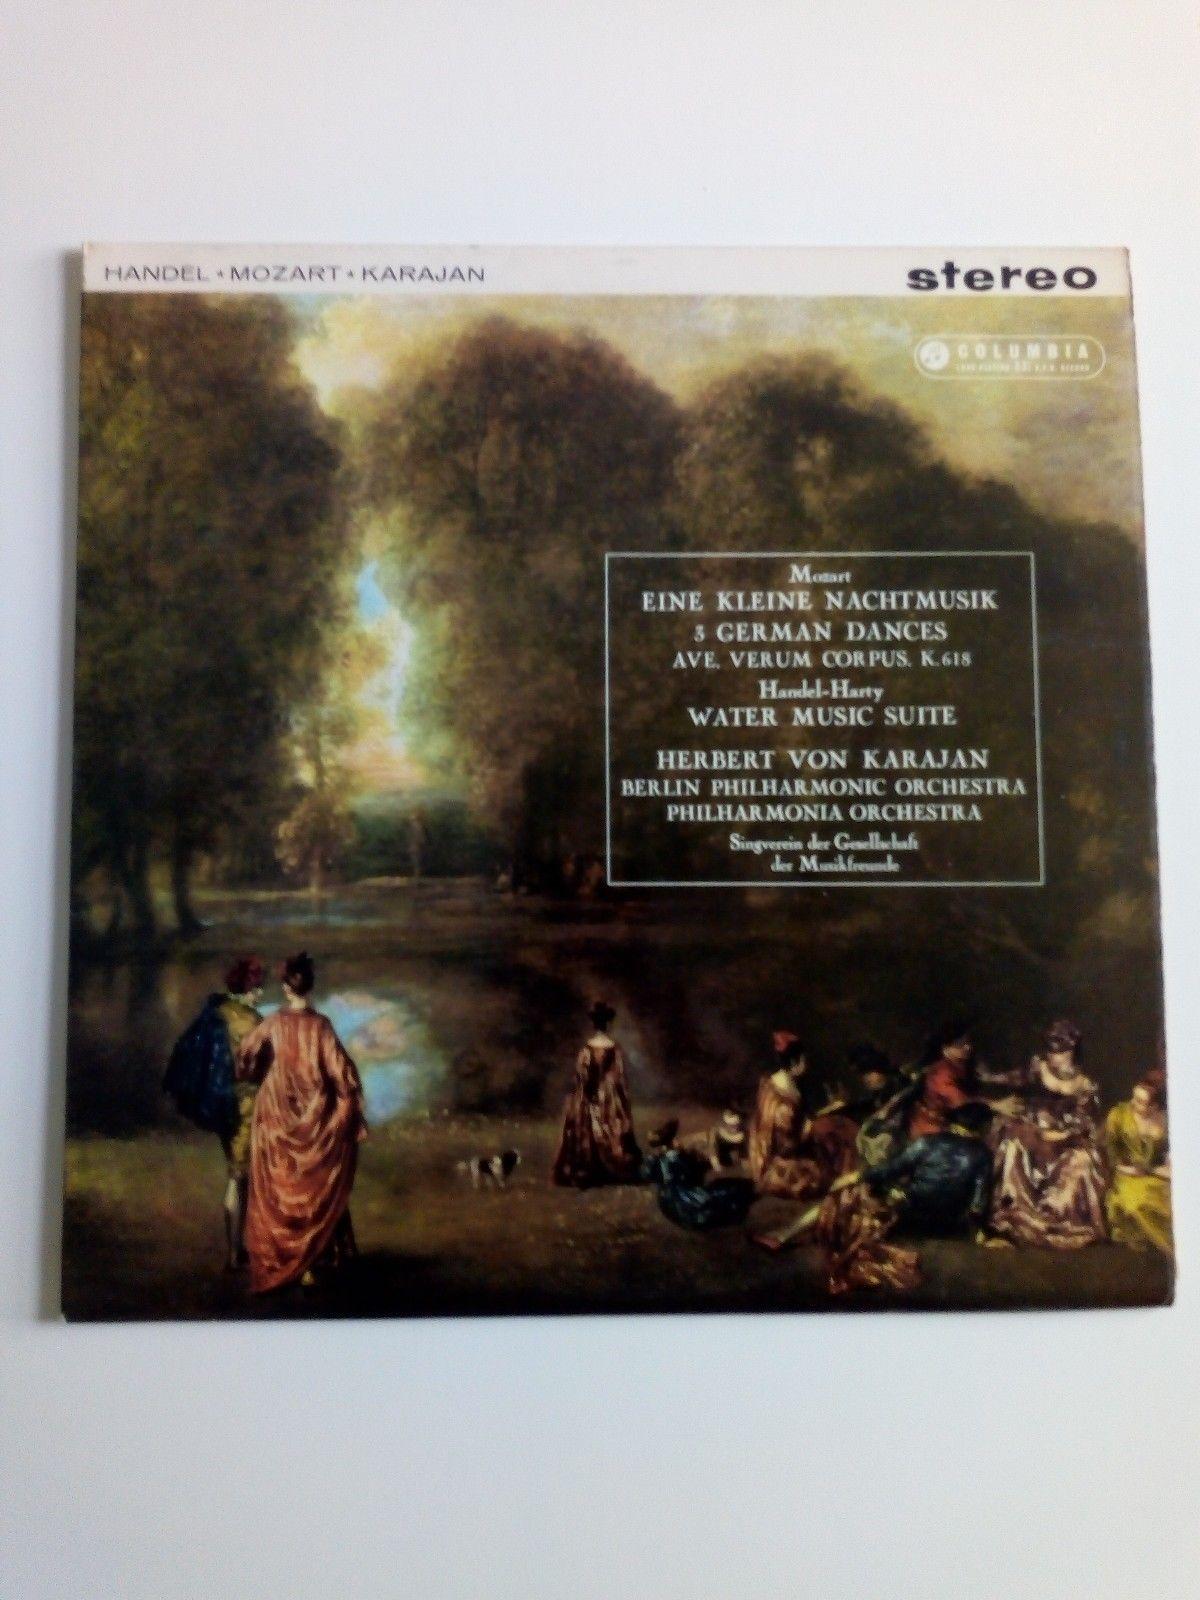 Mozart / Handel - Herbert Von Karajan Columbia SAX 2389 ED1 LP blue silver label